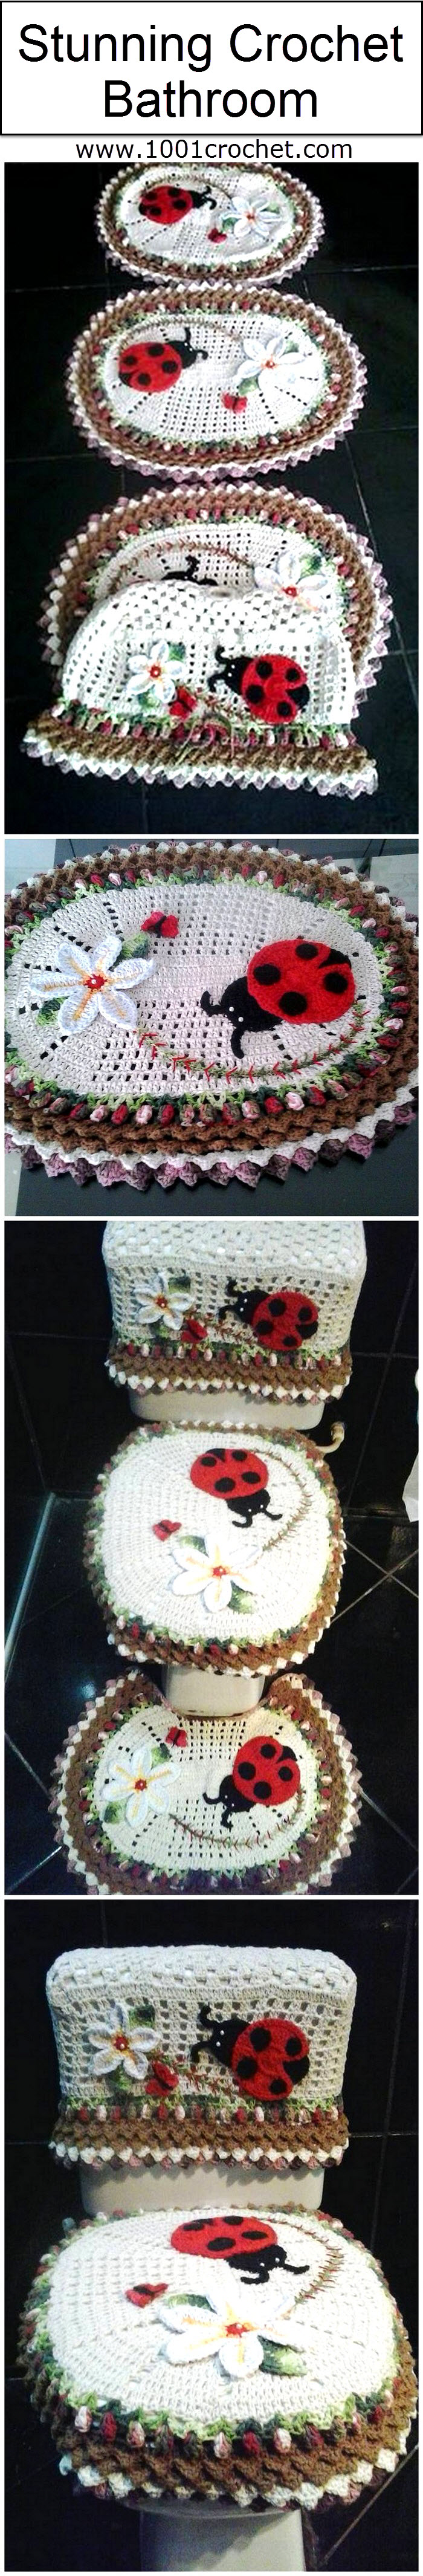 stunning-crochet-bathroom